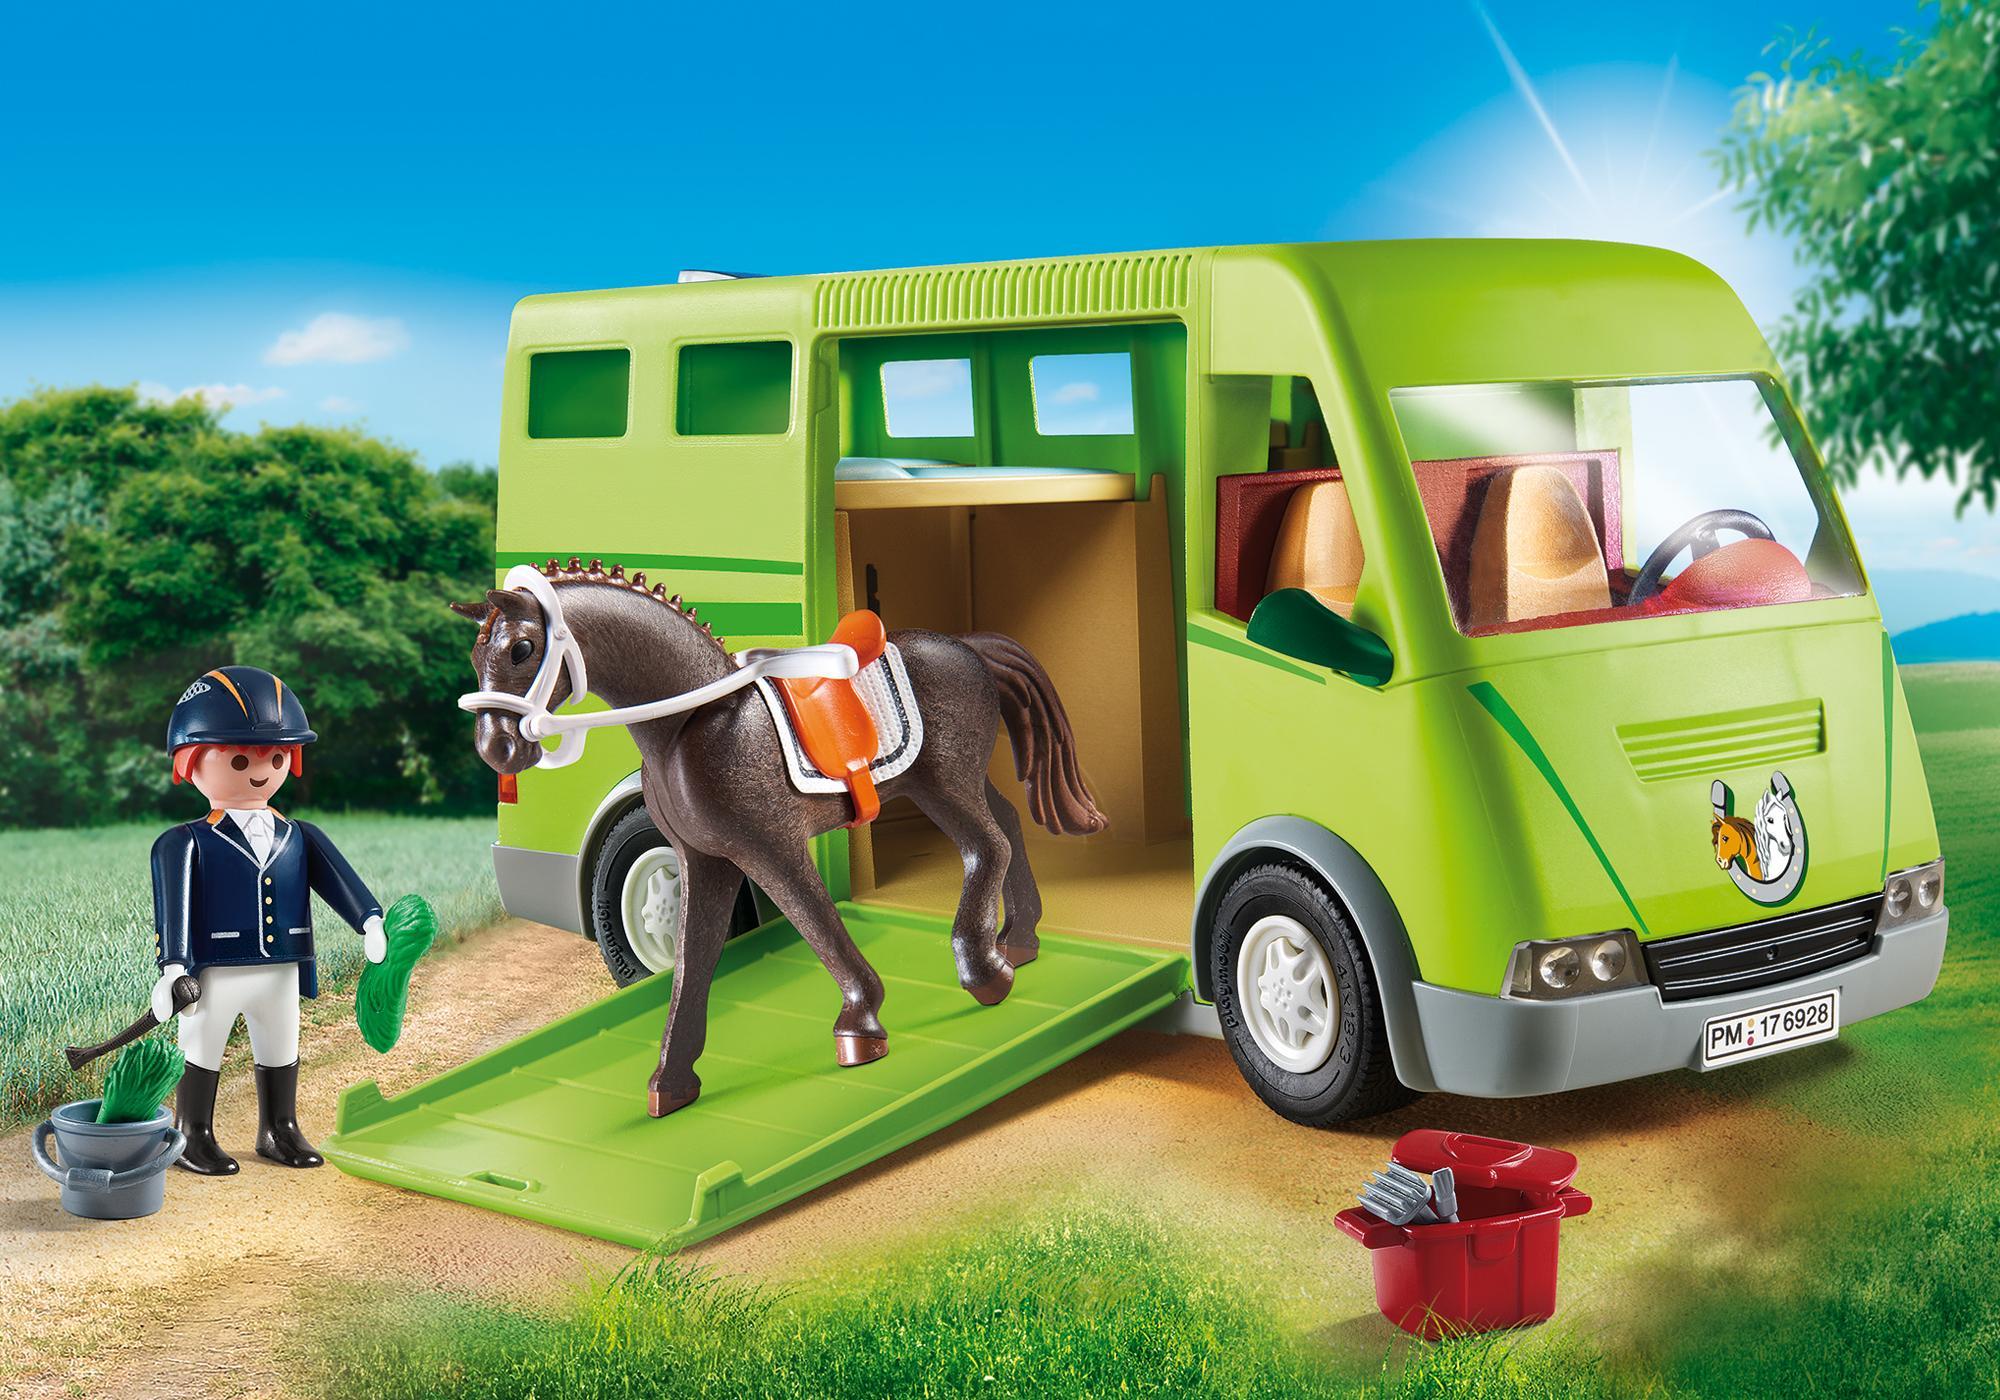 http://media.playmobil.com/i/playmobil/6928_product_detail/Paardenvrachtwagen